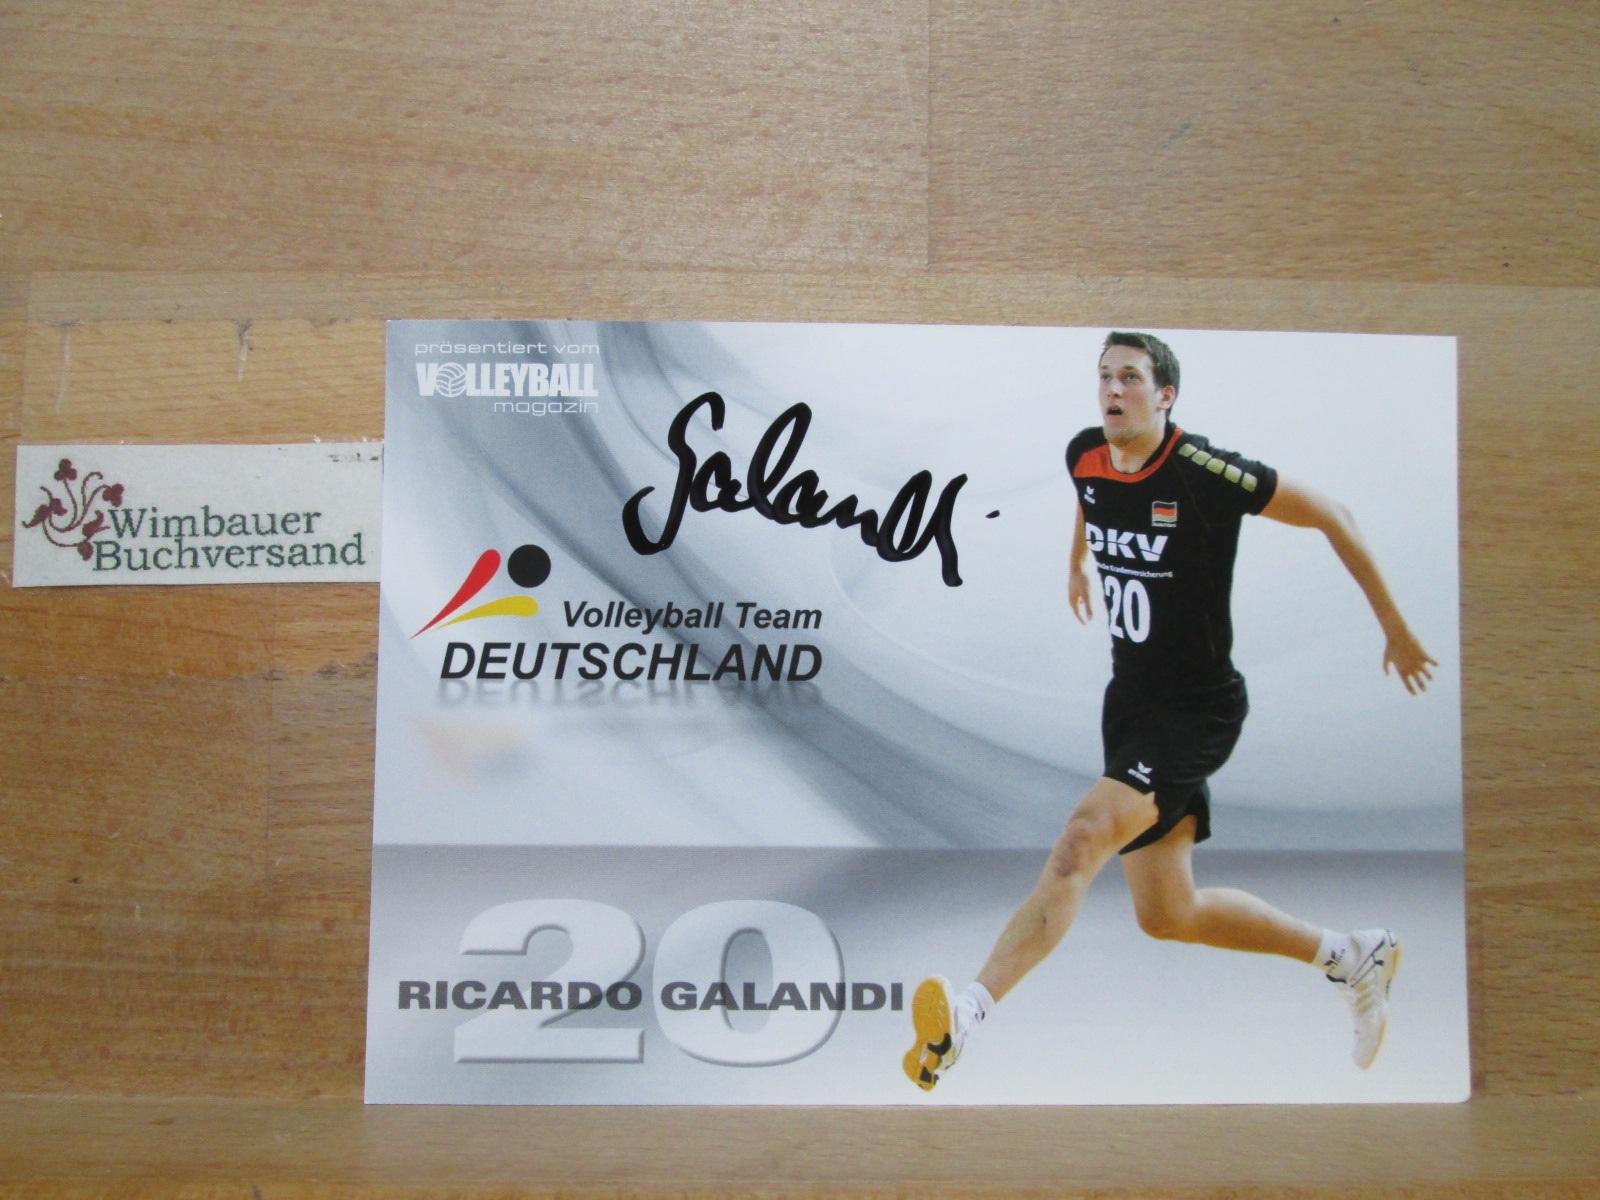 Original Autogramm Ricardo Galandi Volleyball Team Deutschland /// Autogramm Autograph signiert signed signee